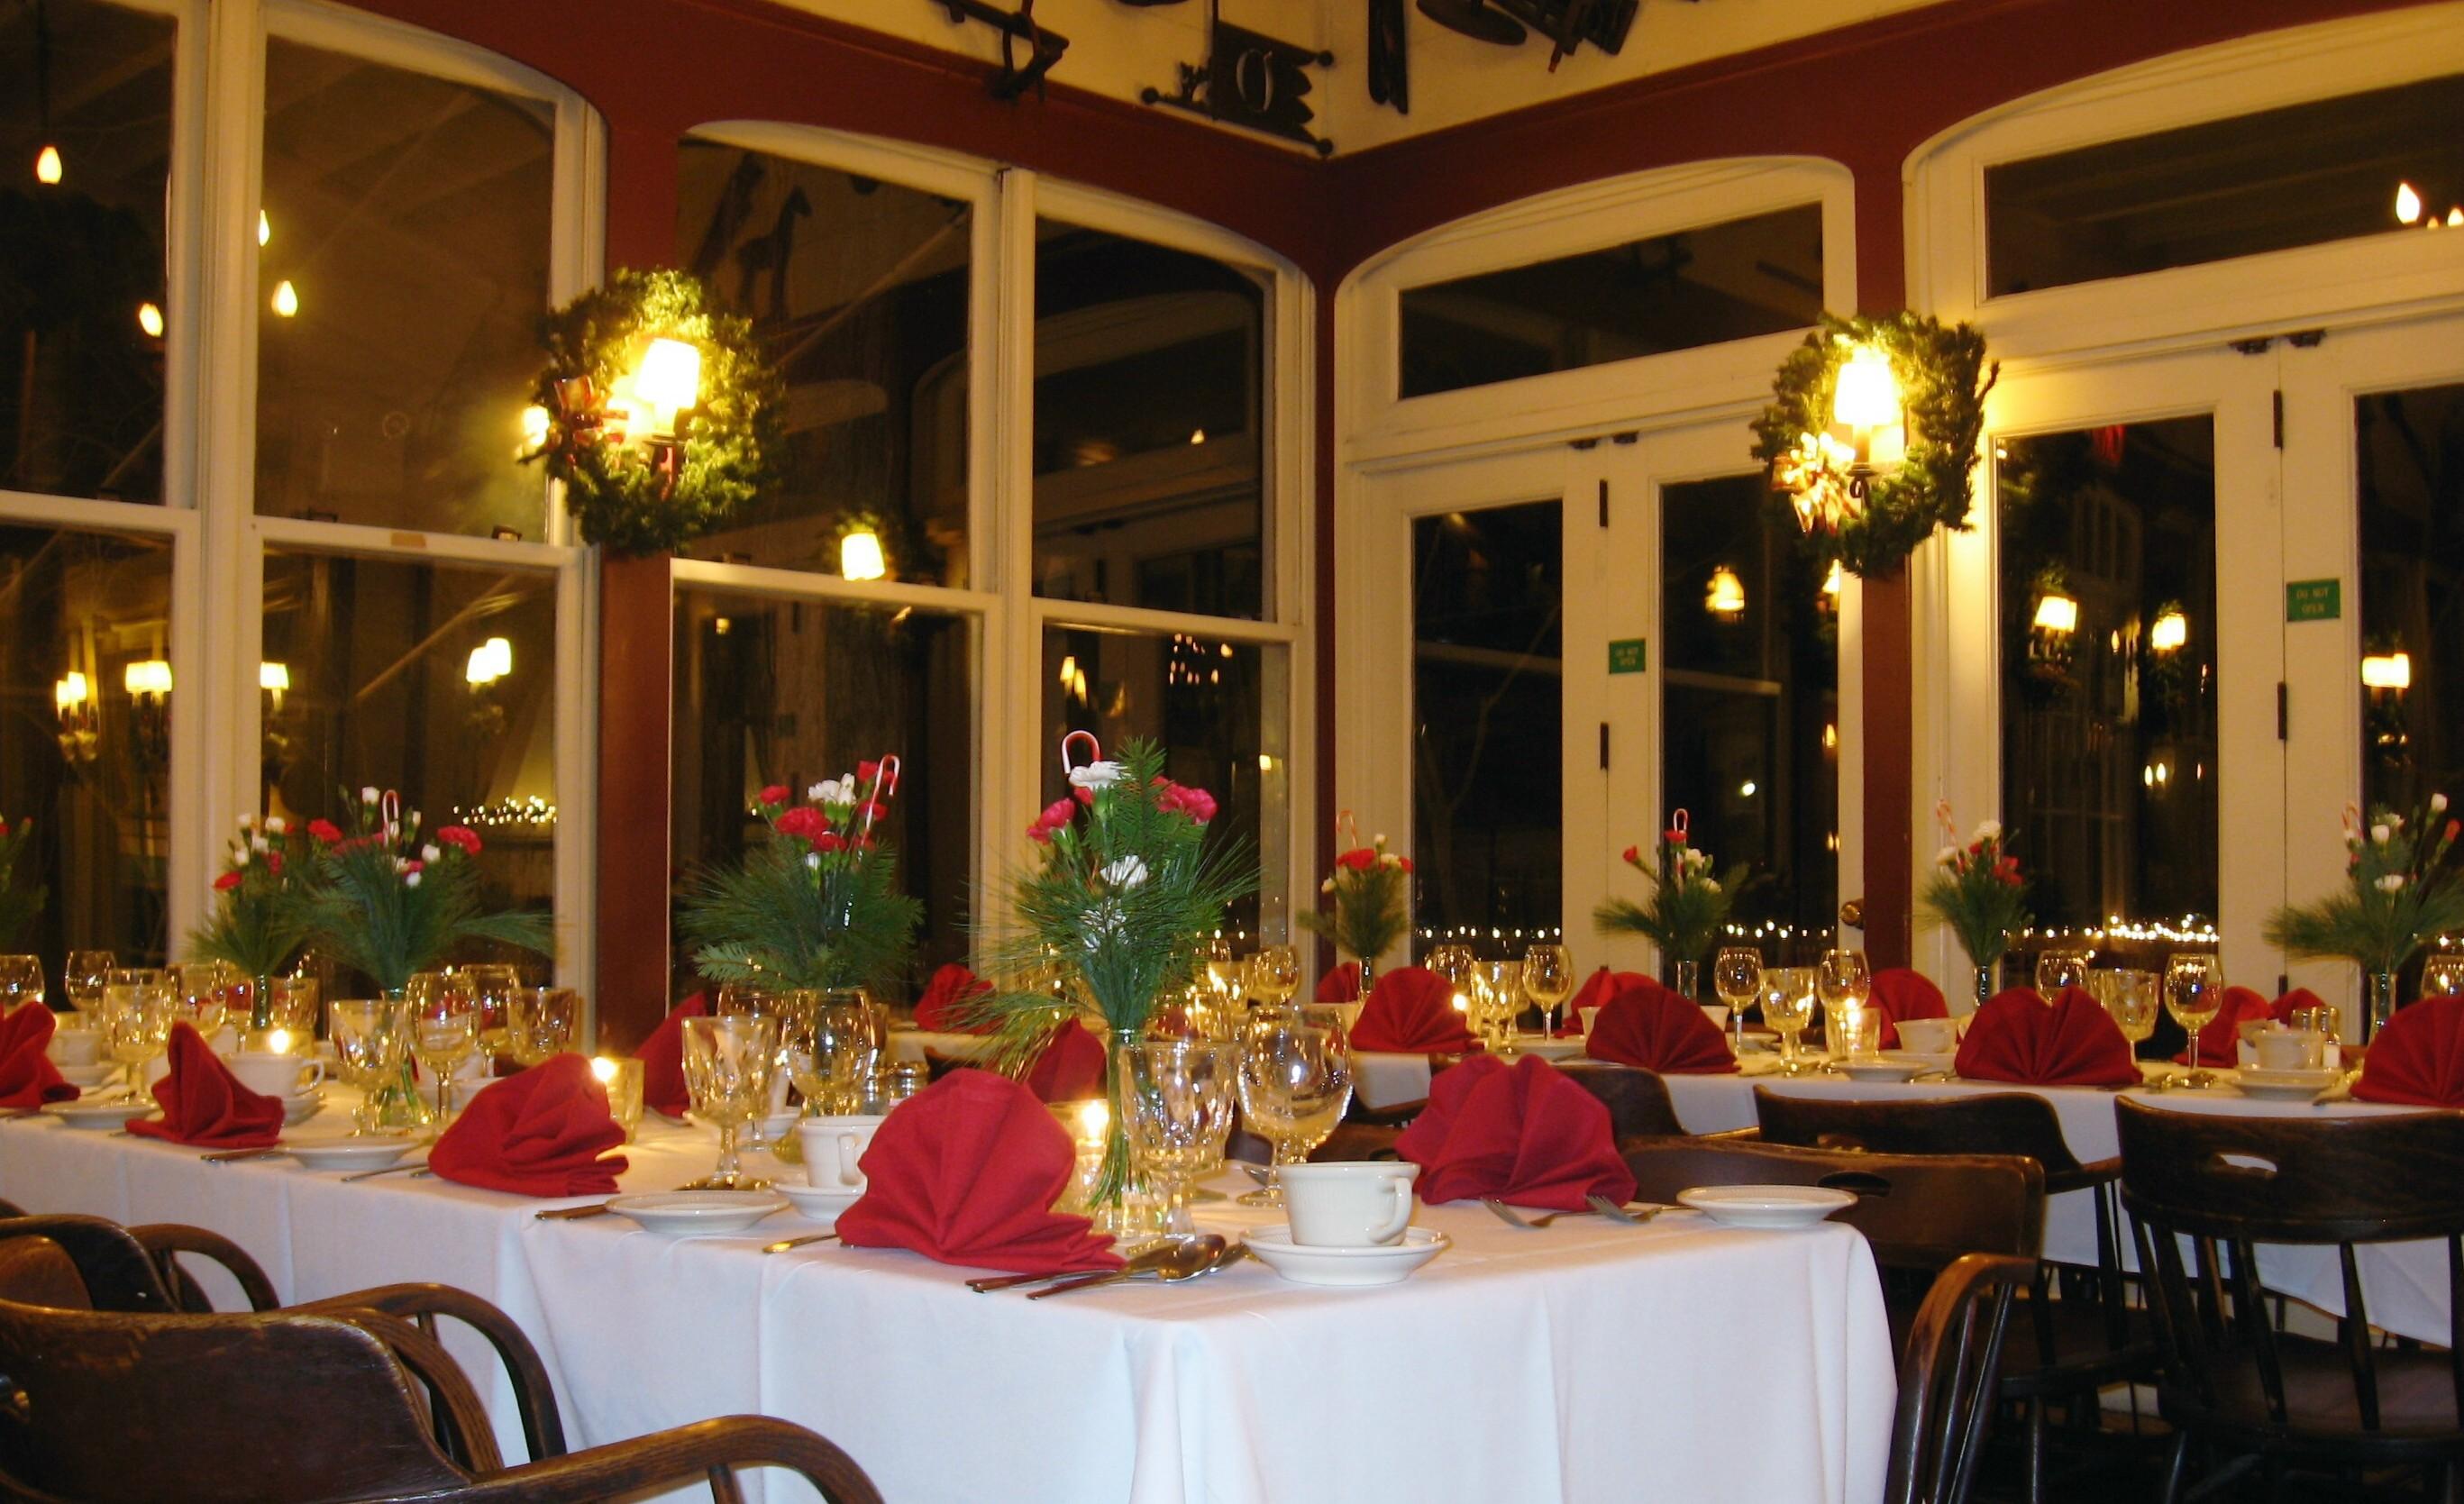 A restaurant Christmas